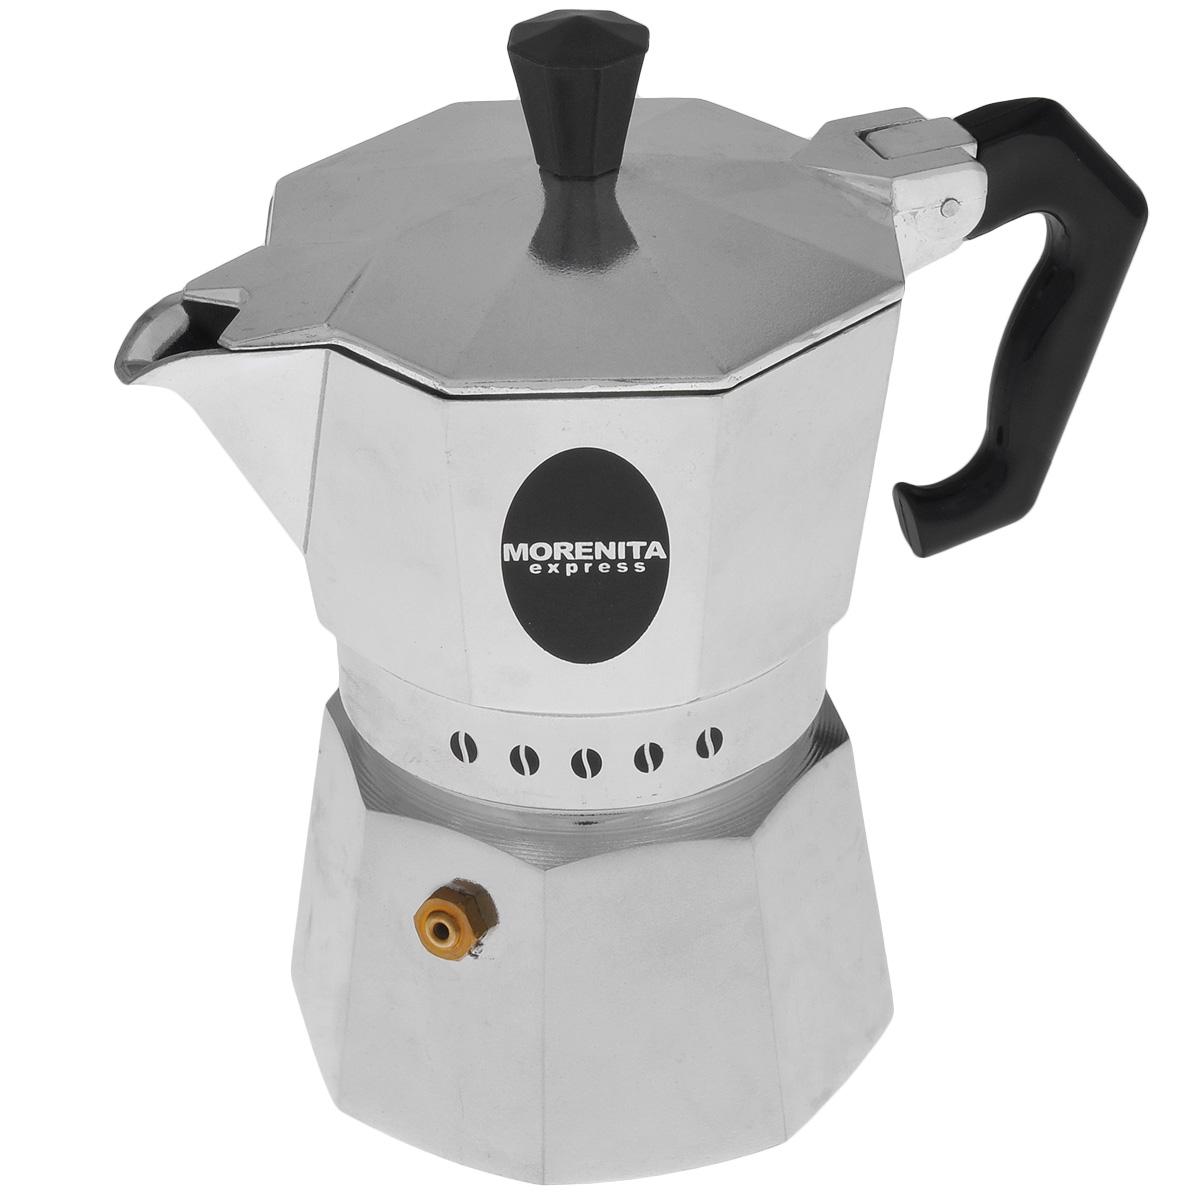 Кофеварка гейзерная Morenita Express, на 3 чашки, 200 мл кофеварки и кофемолки